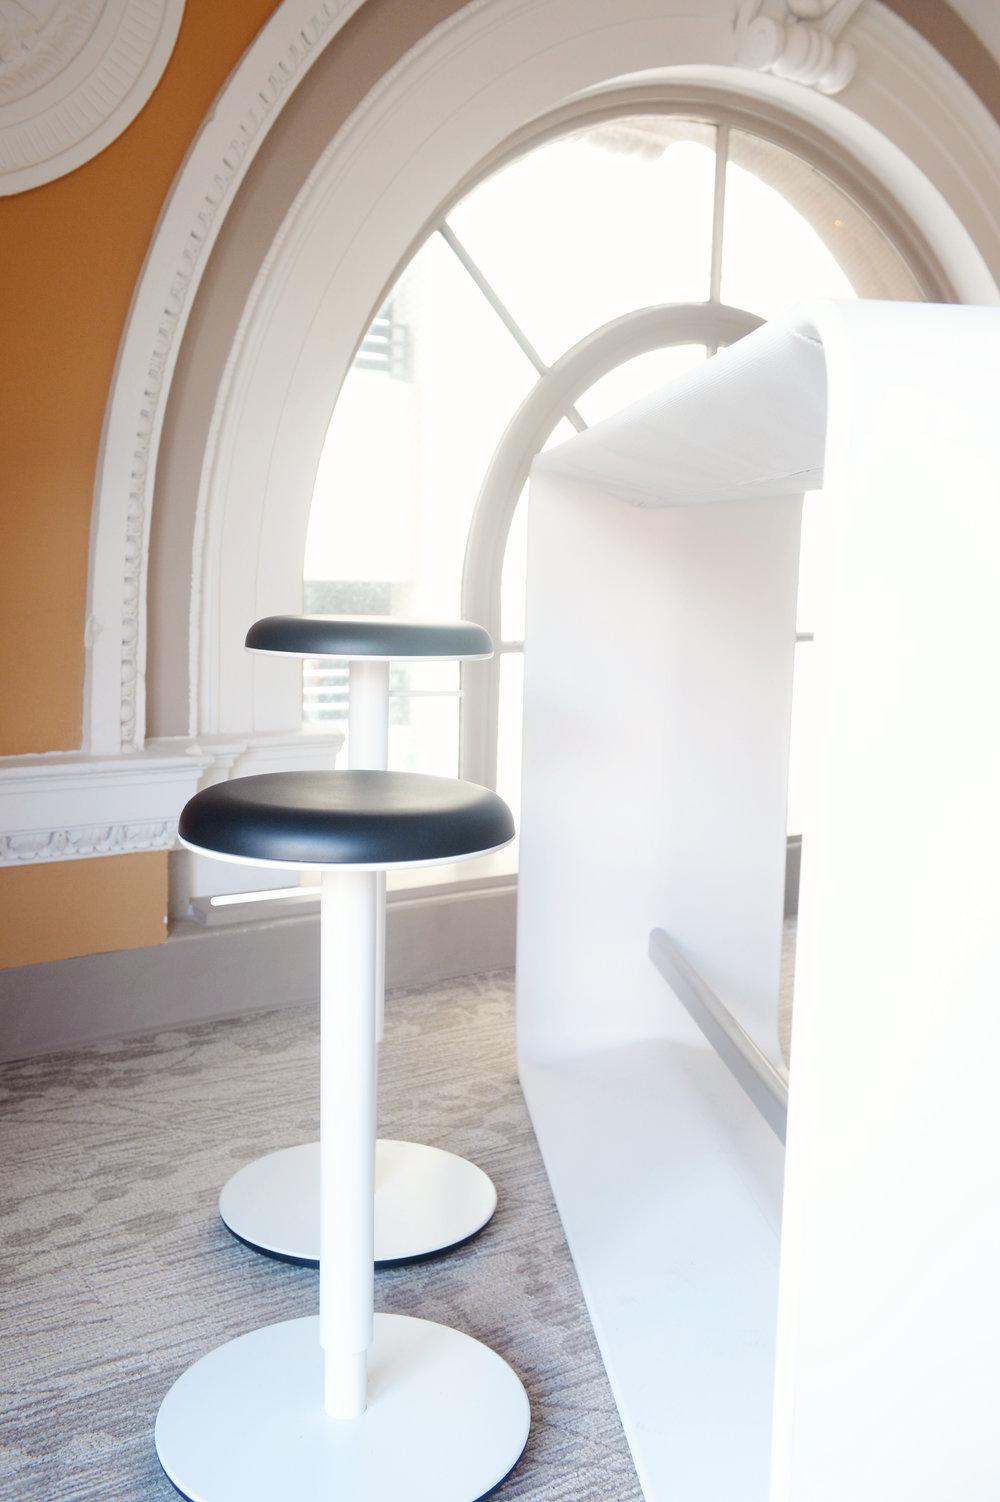 conf room stools.JPG